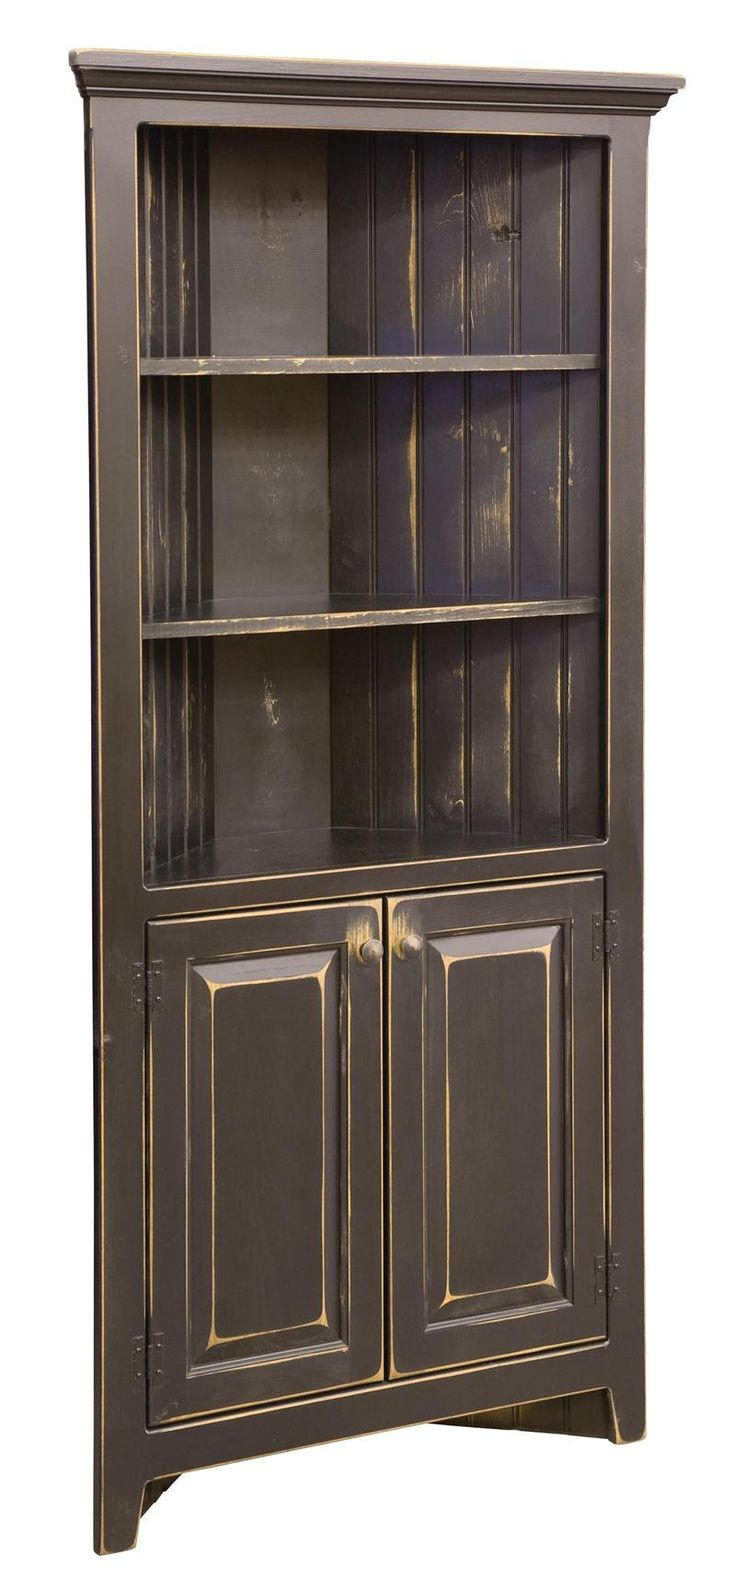 Amish 35 Inch Corner Cabinet · Corner Cabinet KitchenCorner HutchCorner ...